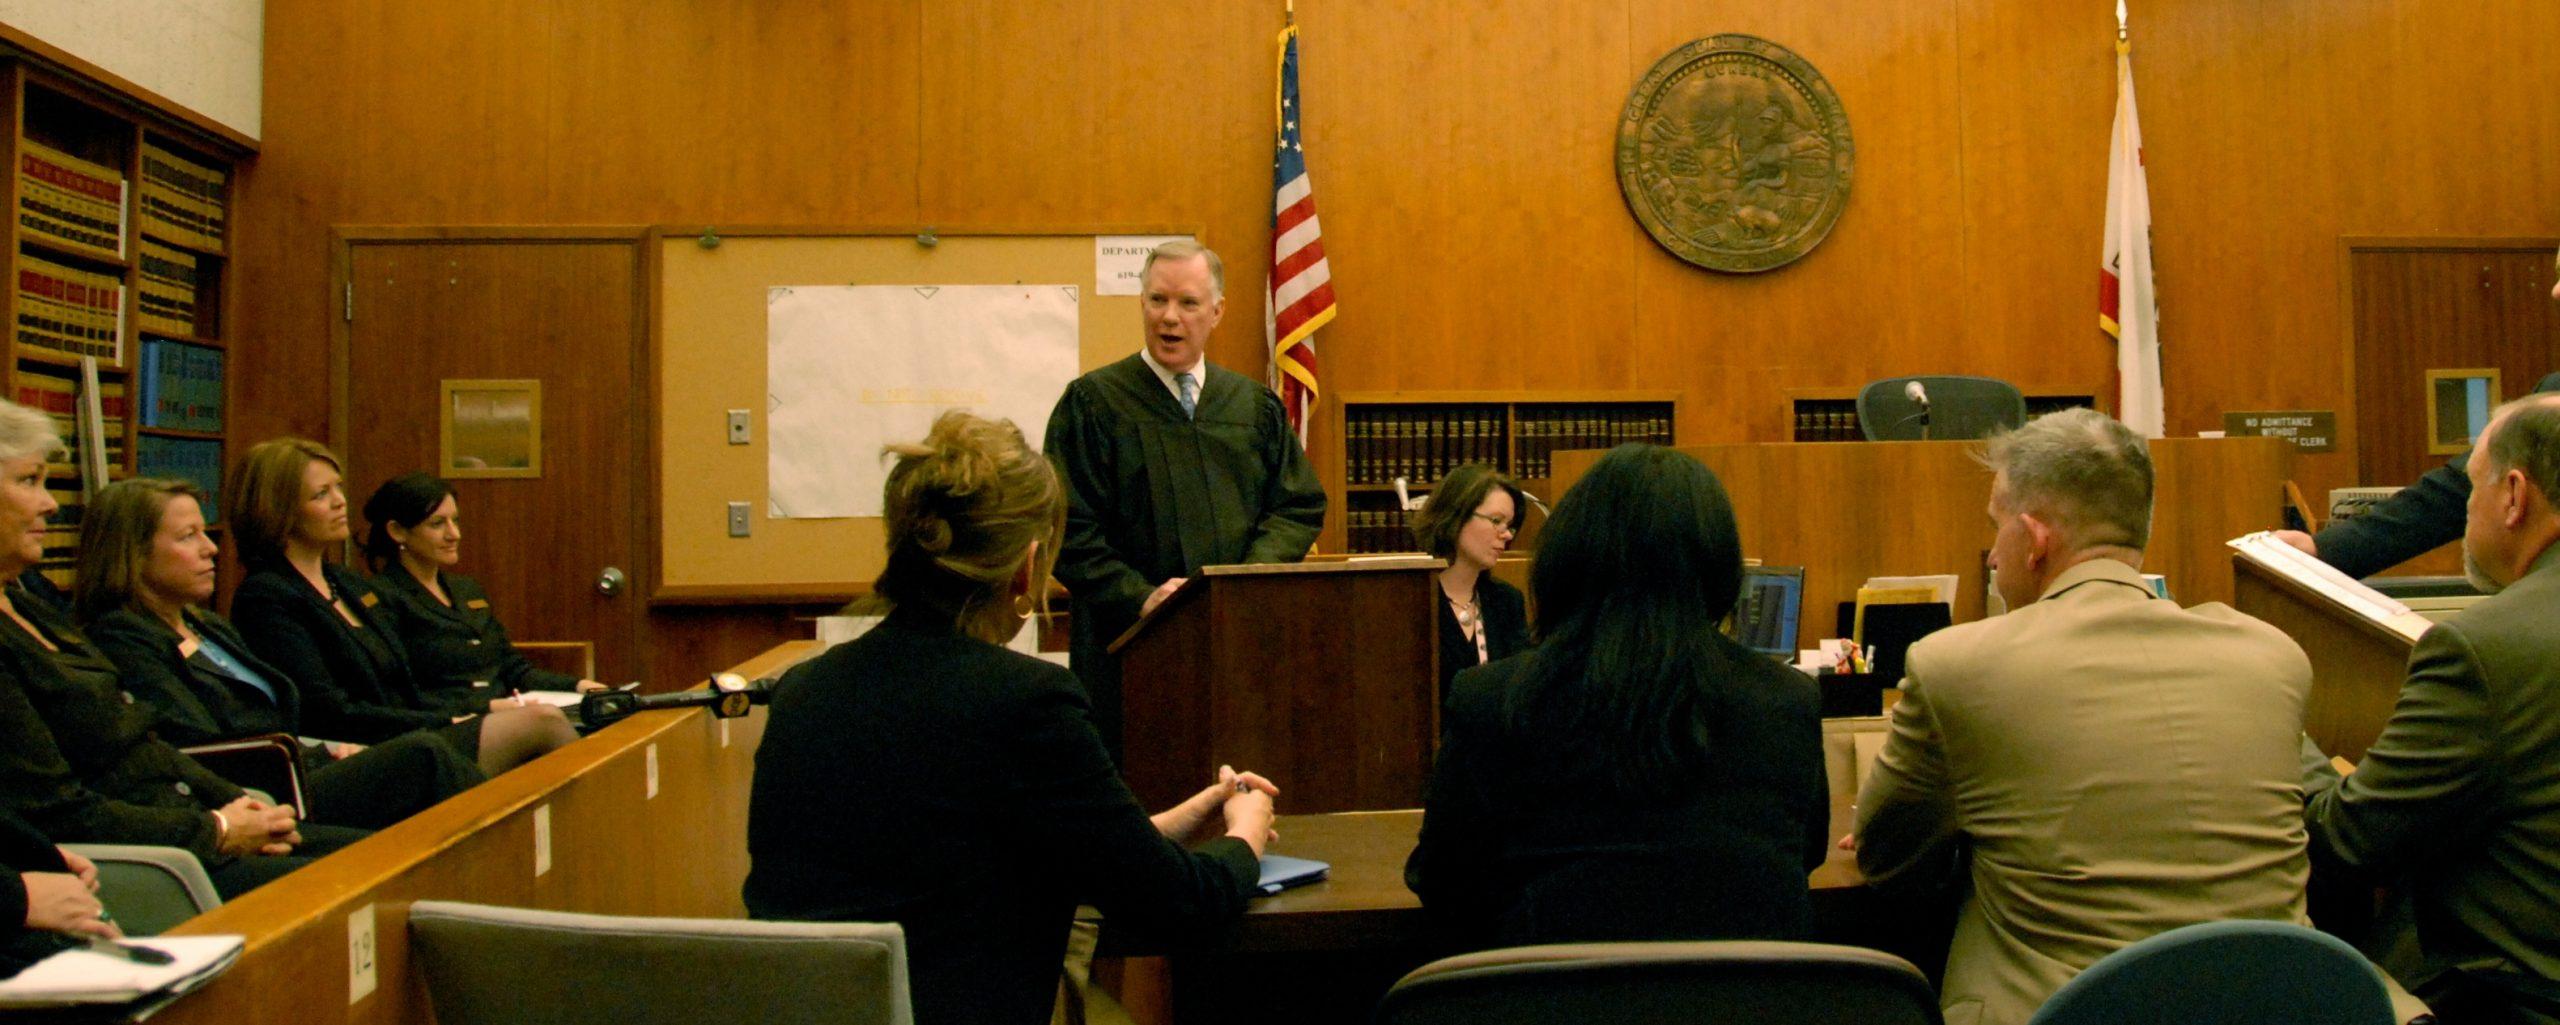 Veterans Get Clean Slate Through Court Program Kpbs